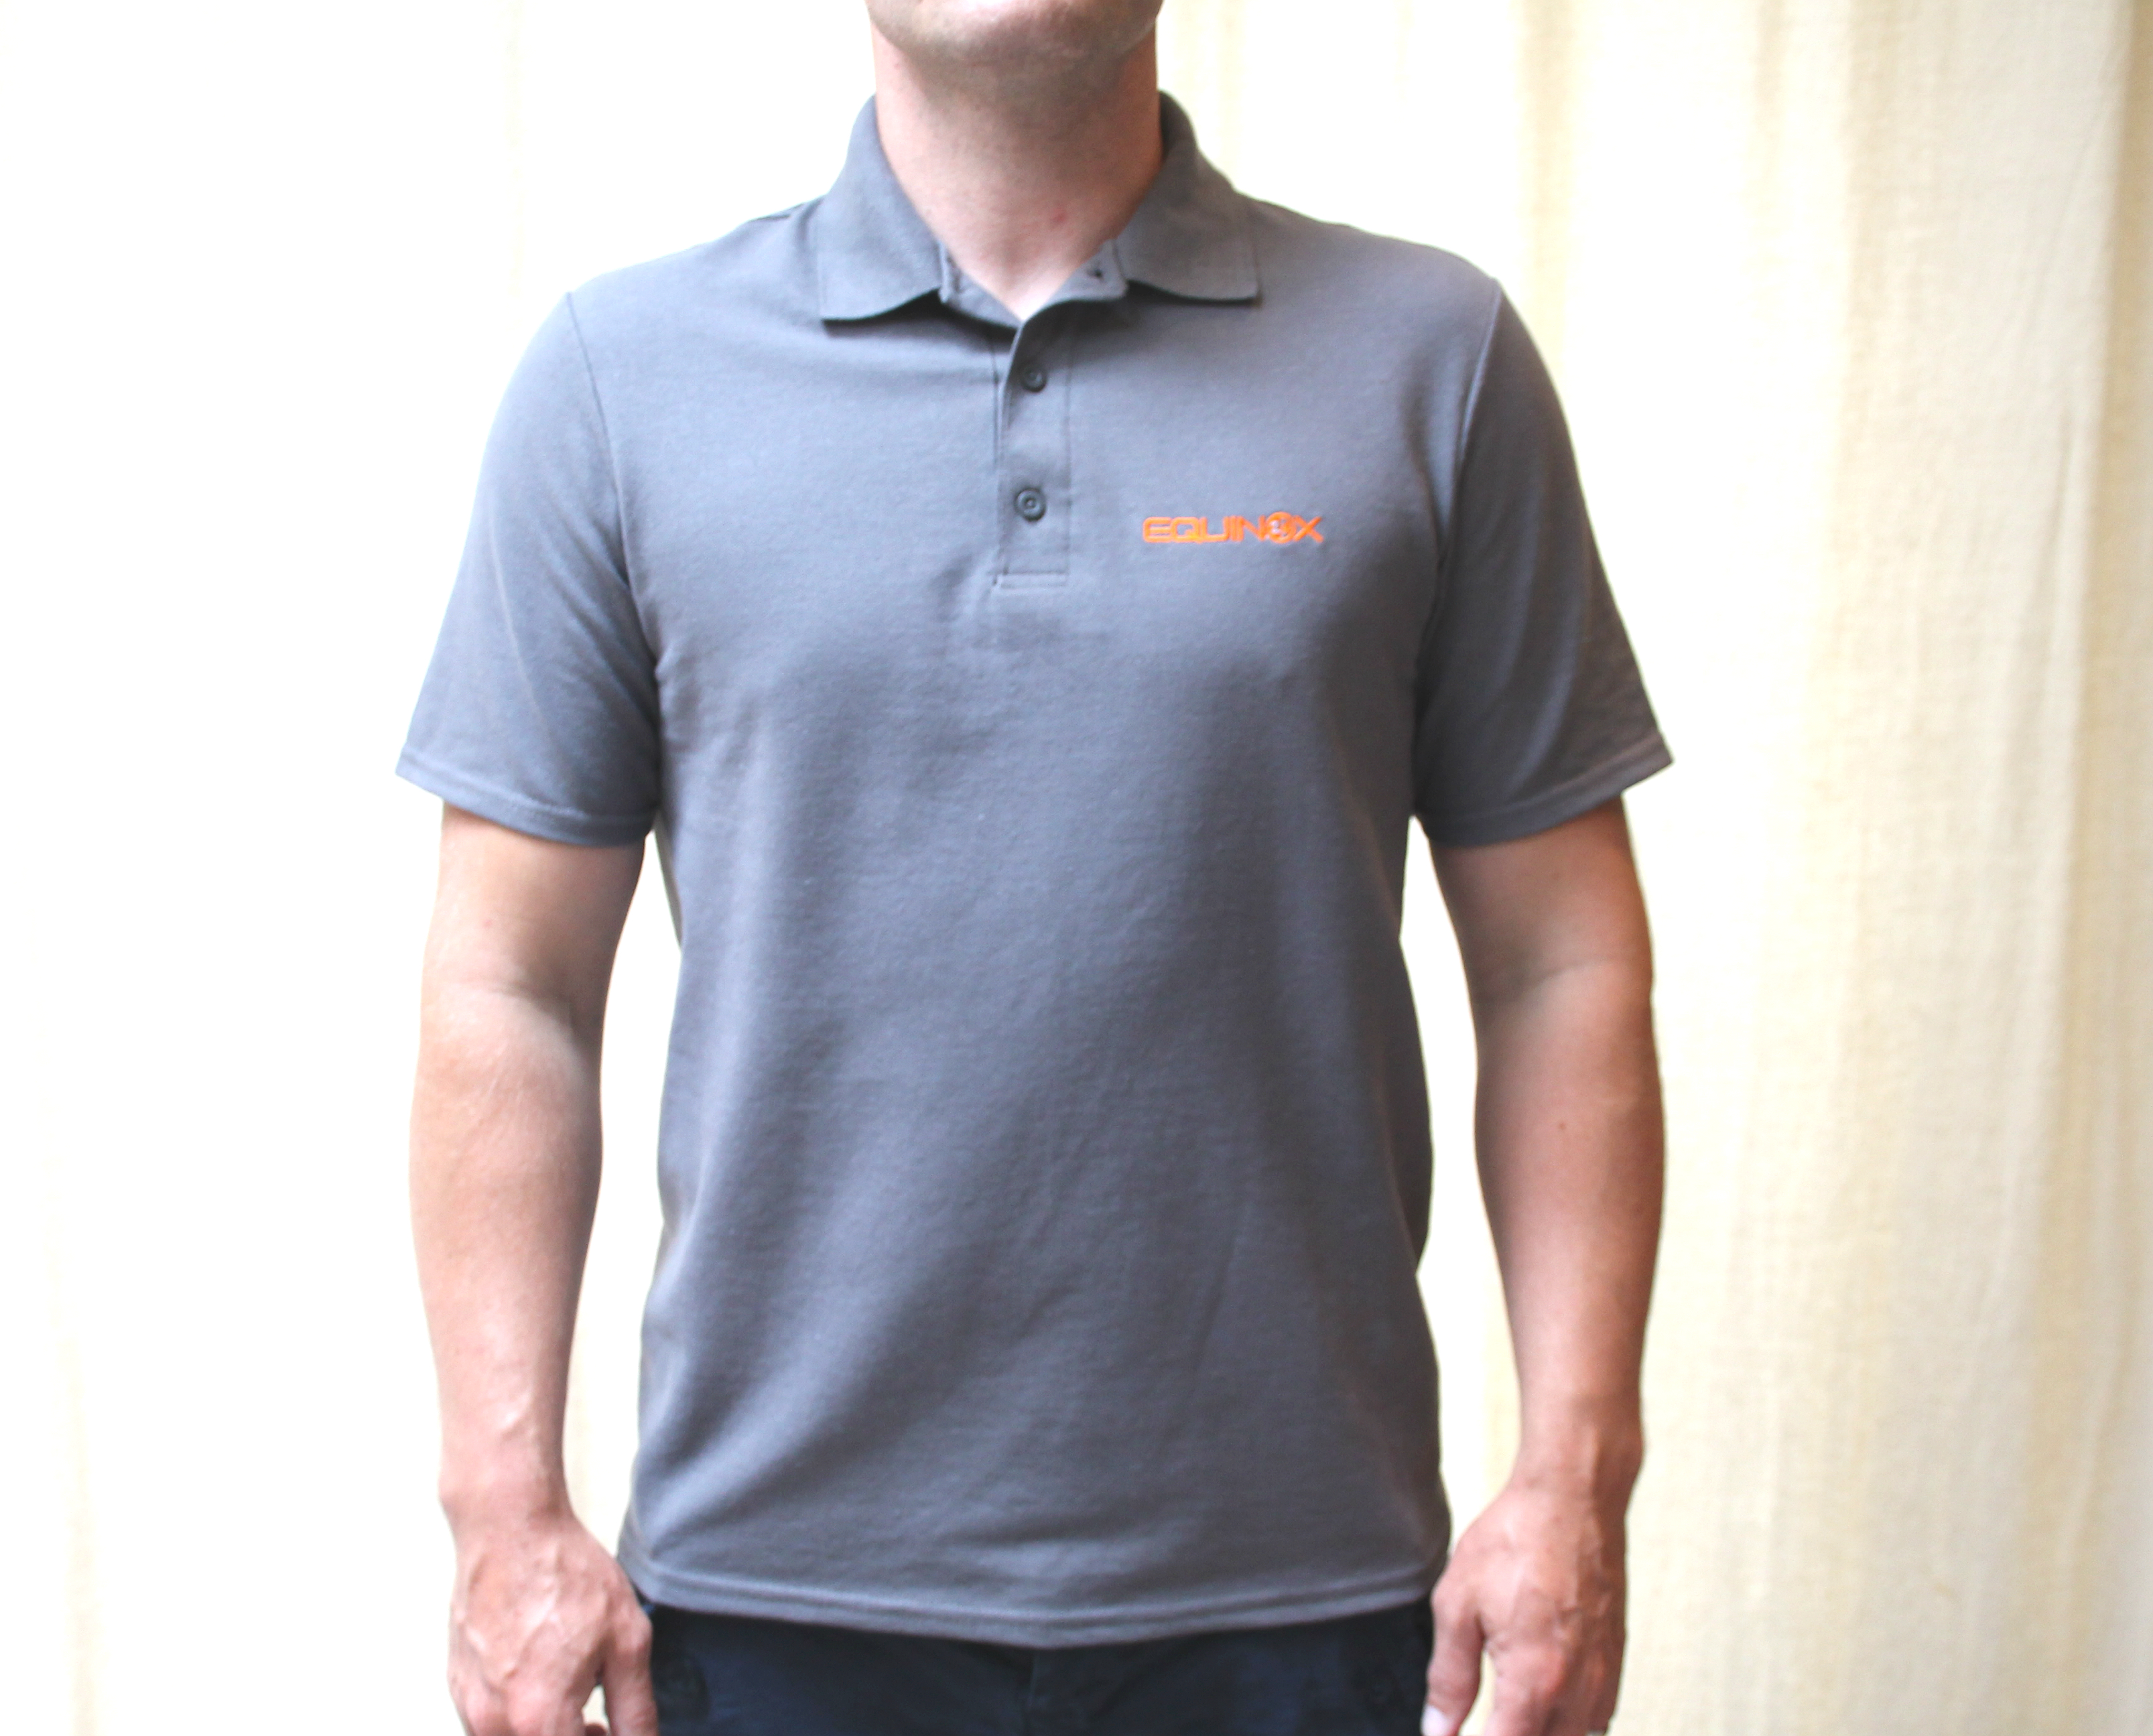 193c86c018f Grey Equinox24 Embroidered Logo Polo Shirt